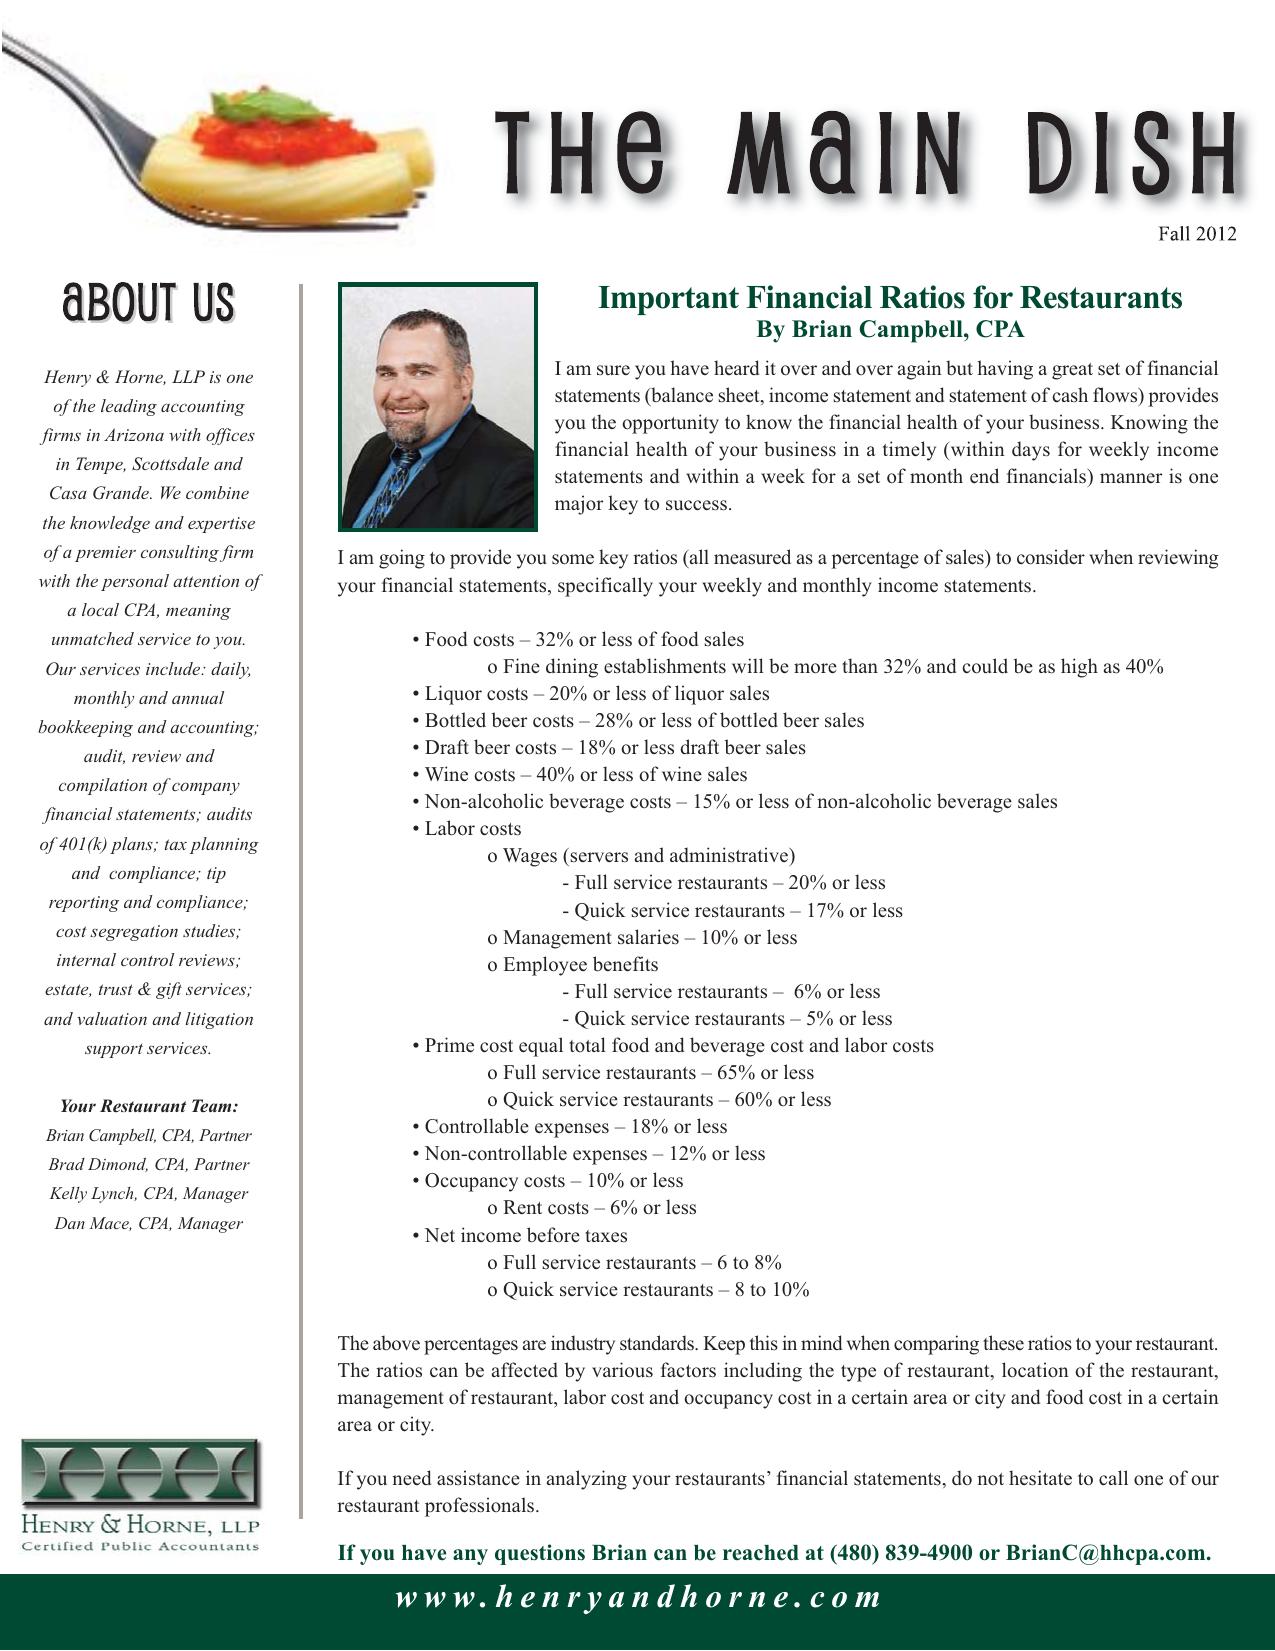 Important Financial Ratios for Restaurants